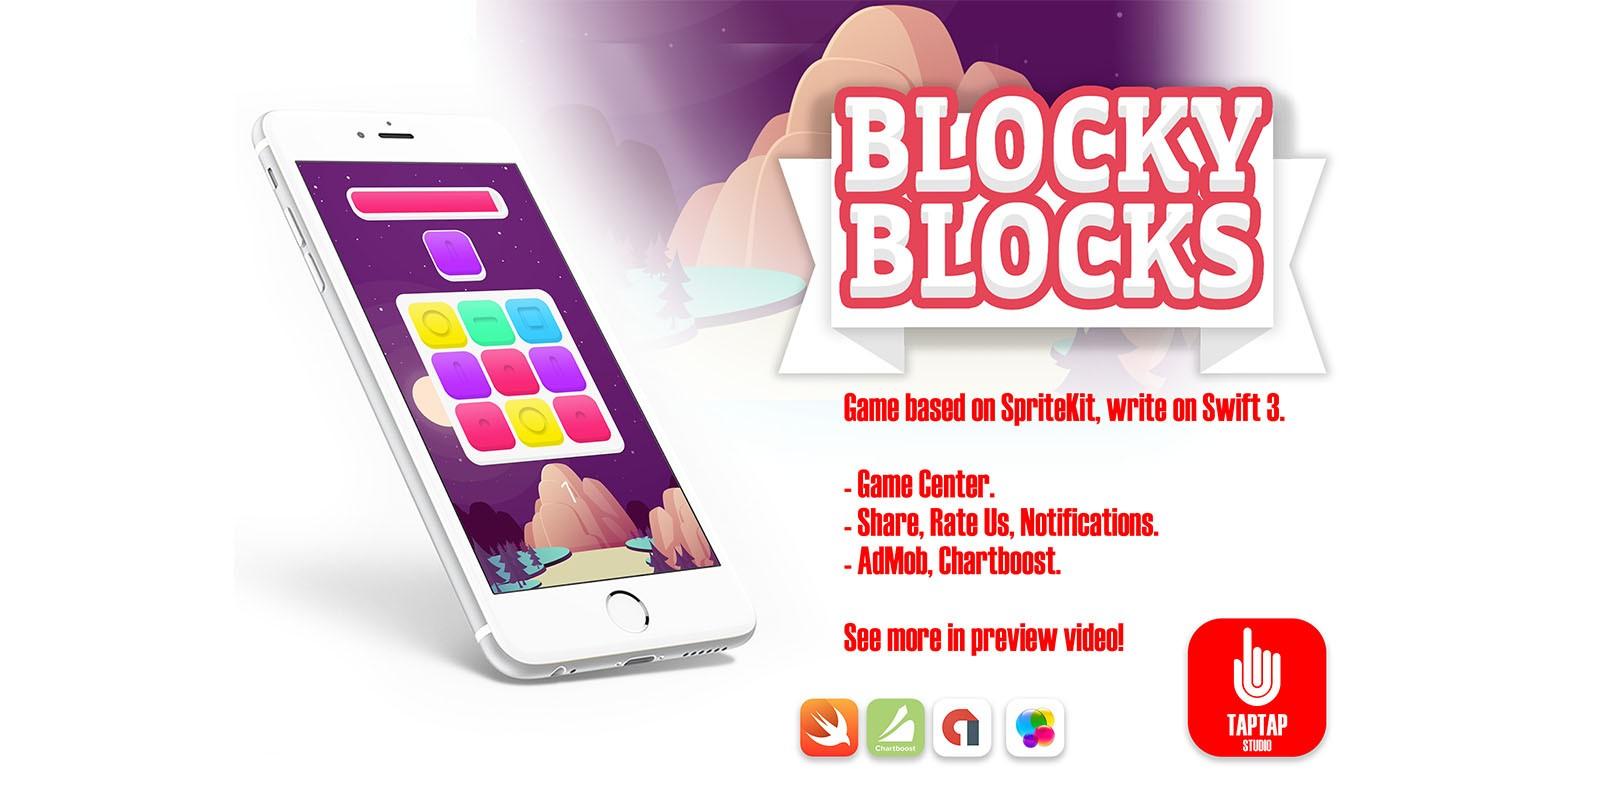 Blocky Blocks - iOS Xcode Source Code